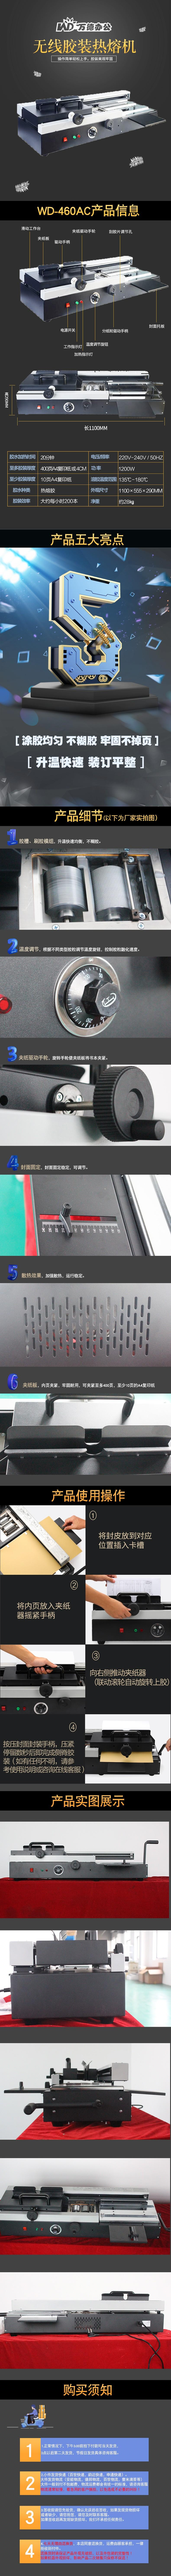 WD-460AC 中文詳情.jpg